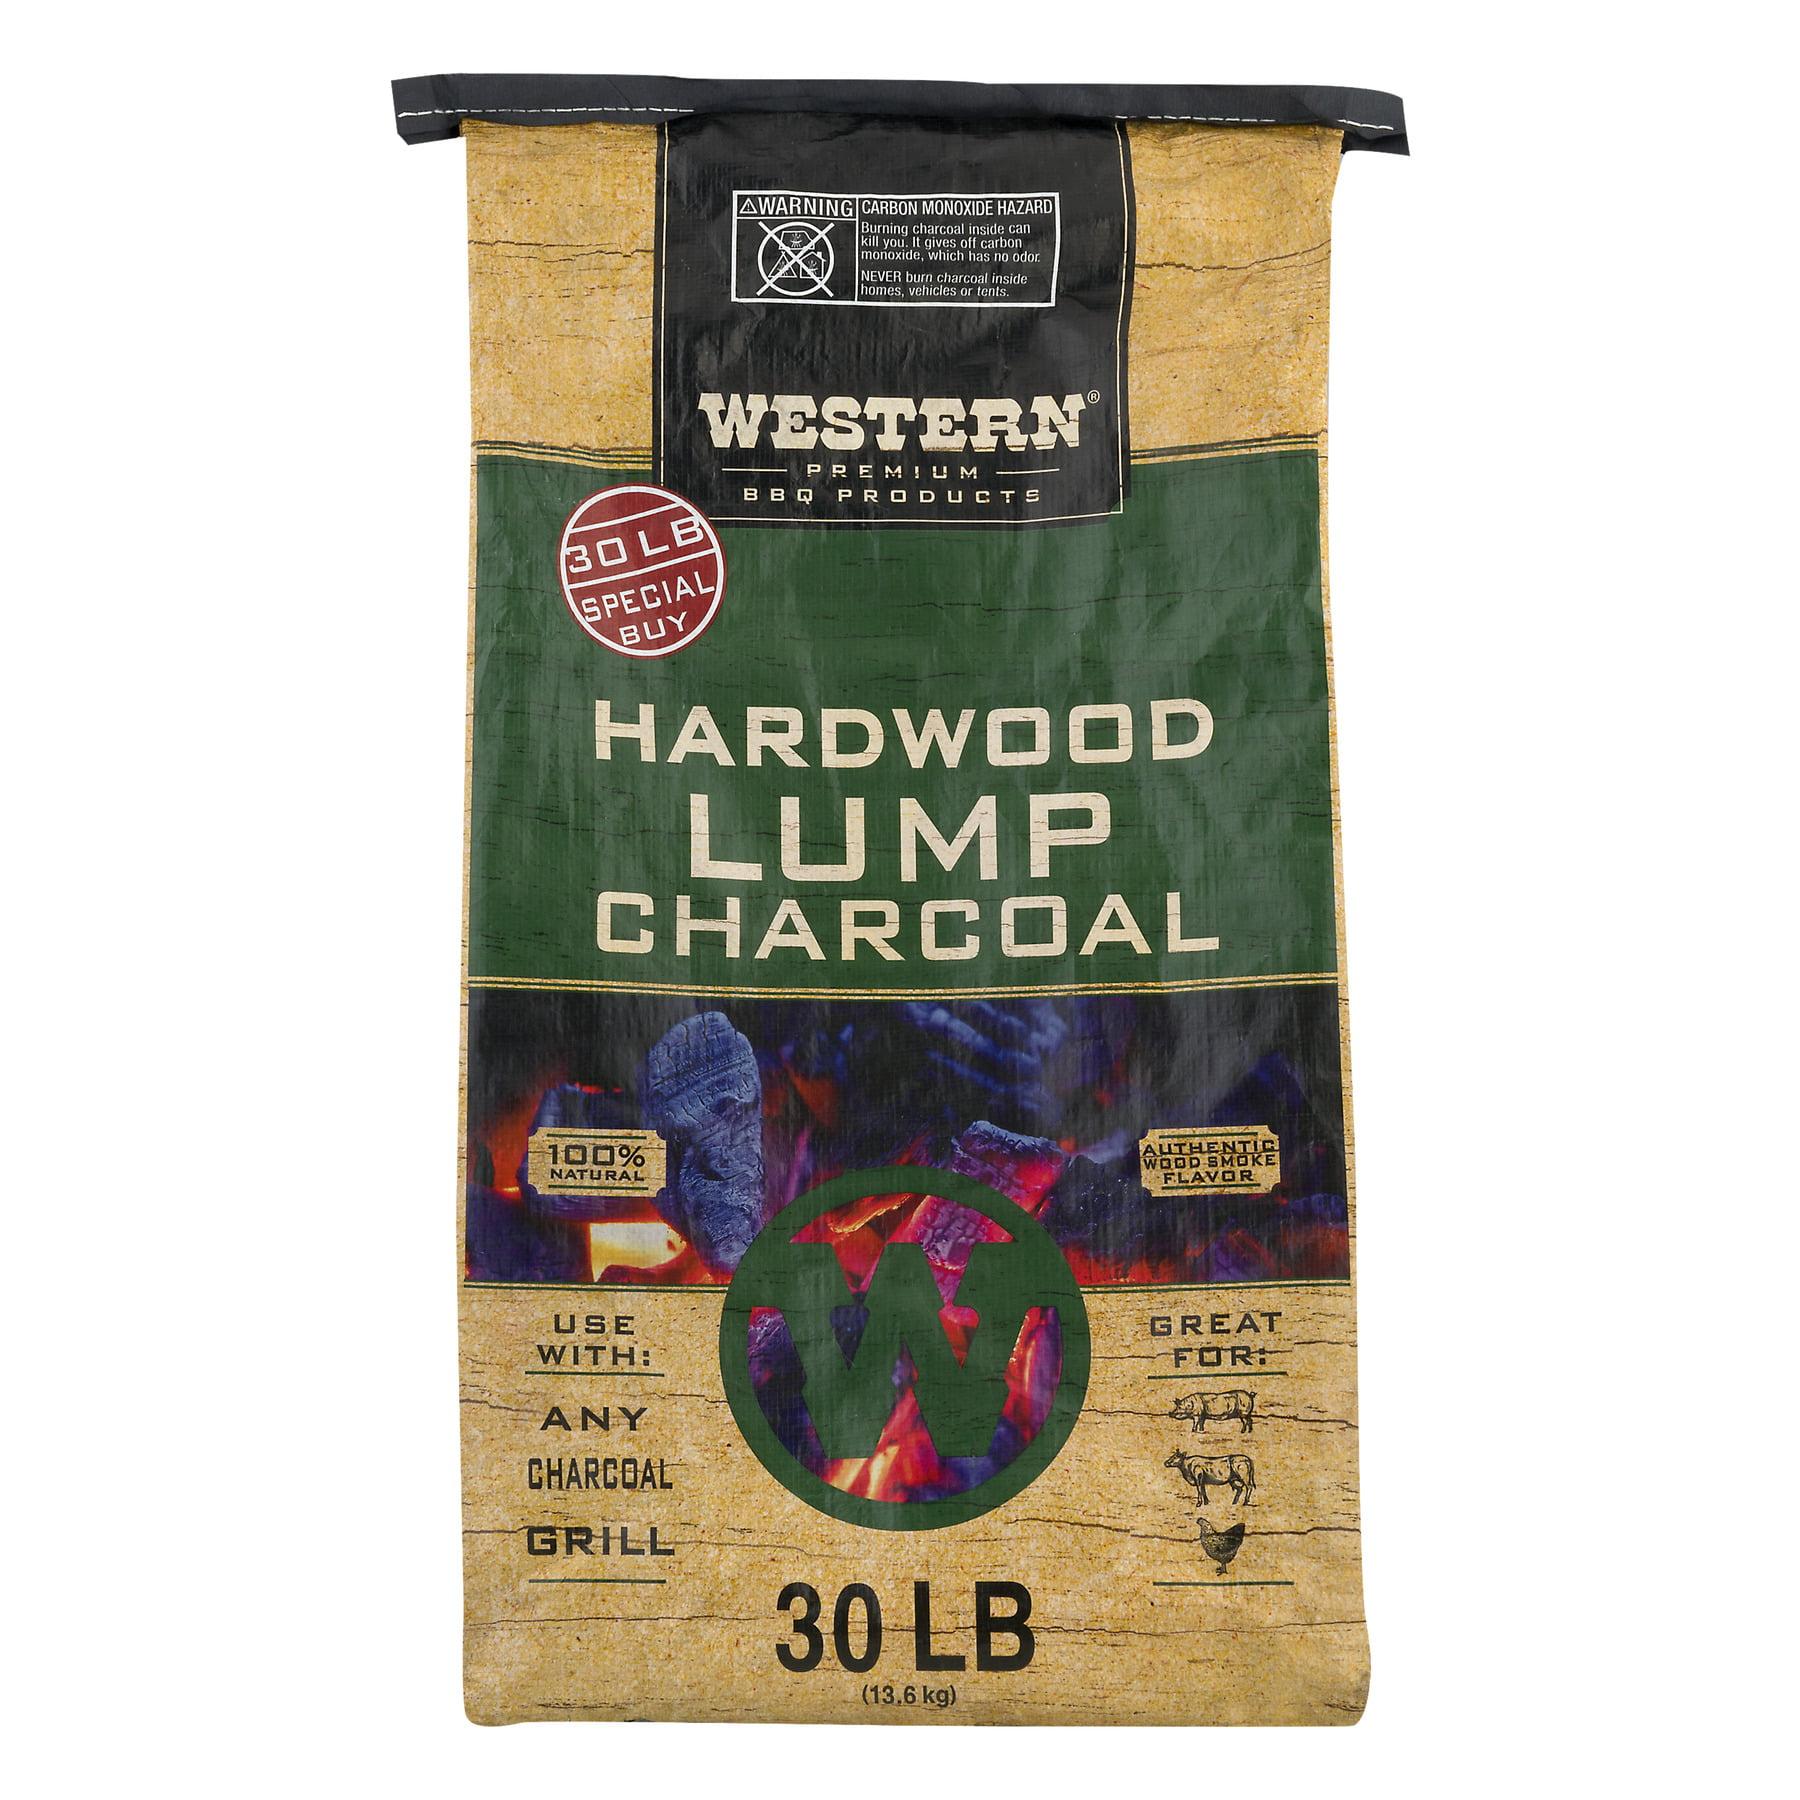 Western Premium BBQ 30LB Hardwood Lump Charcoal